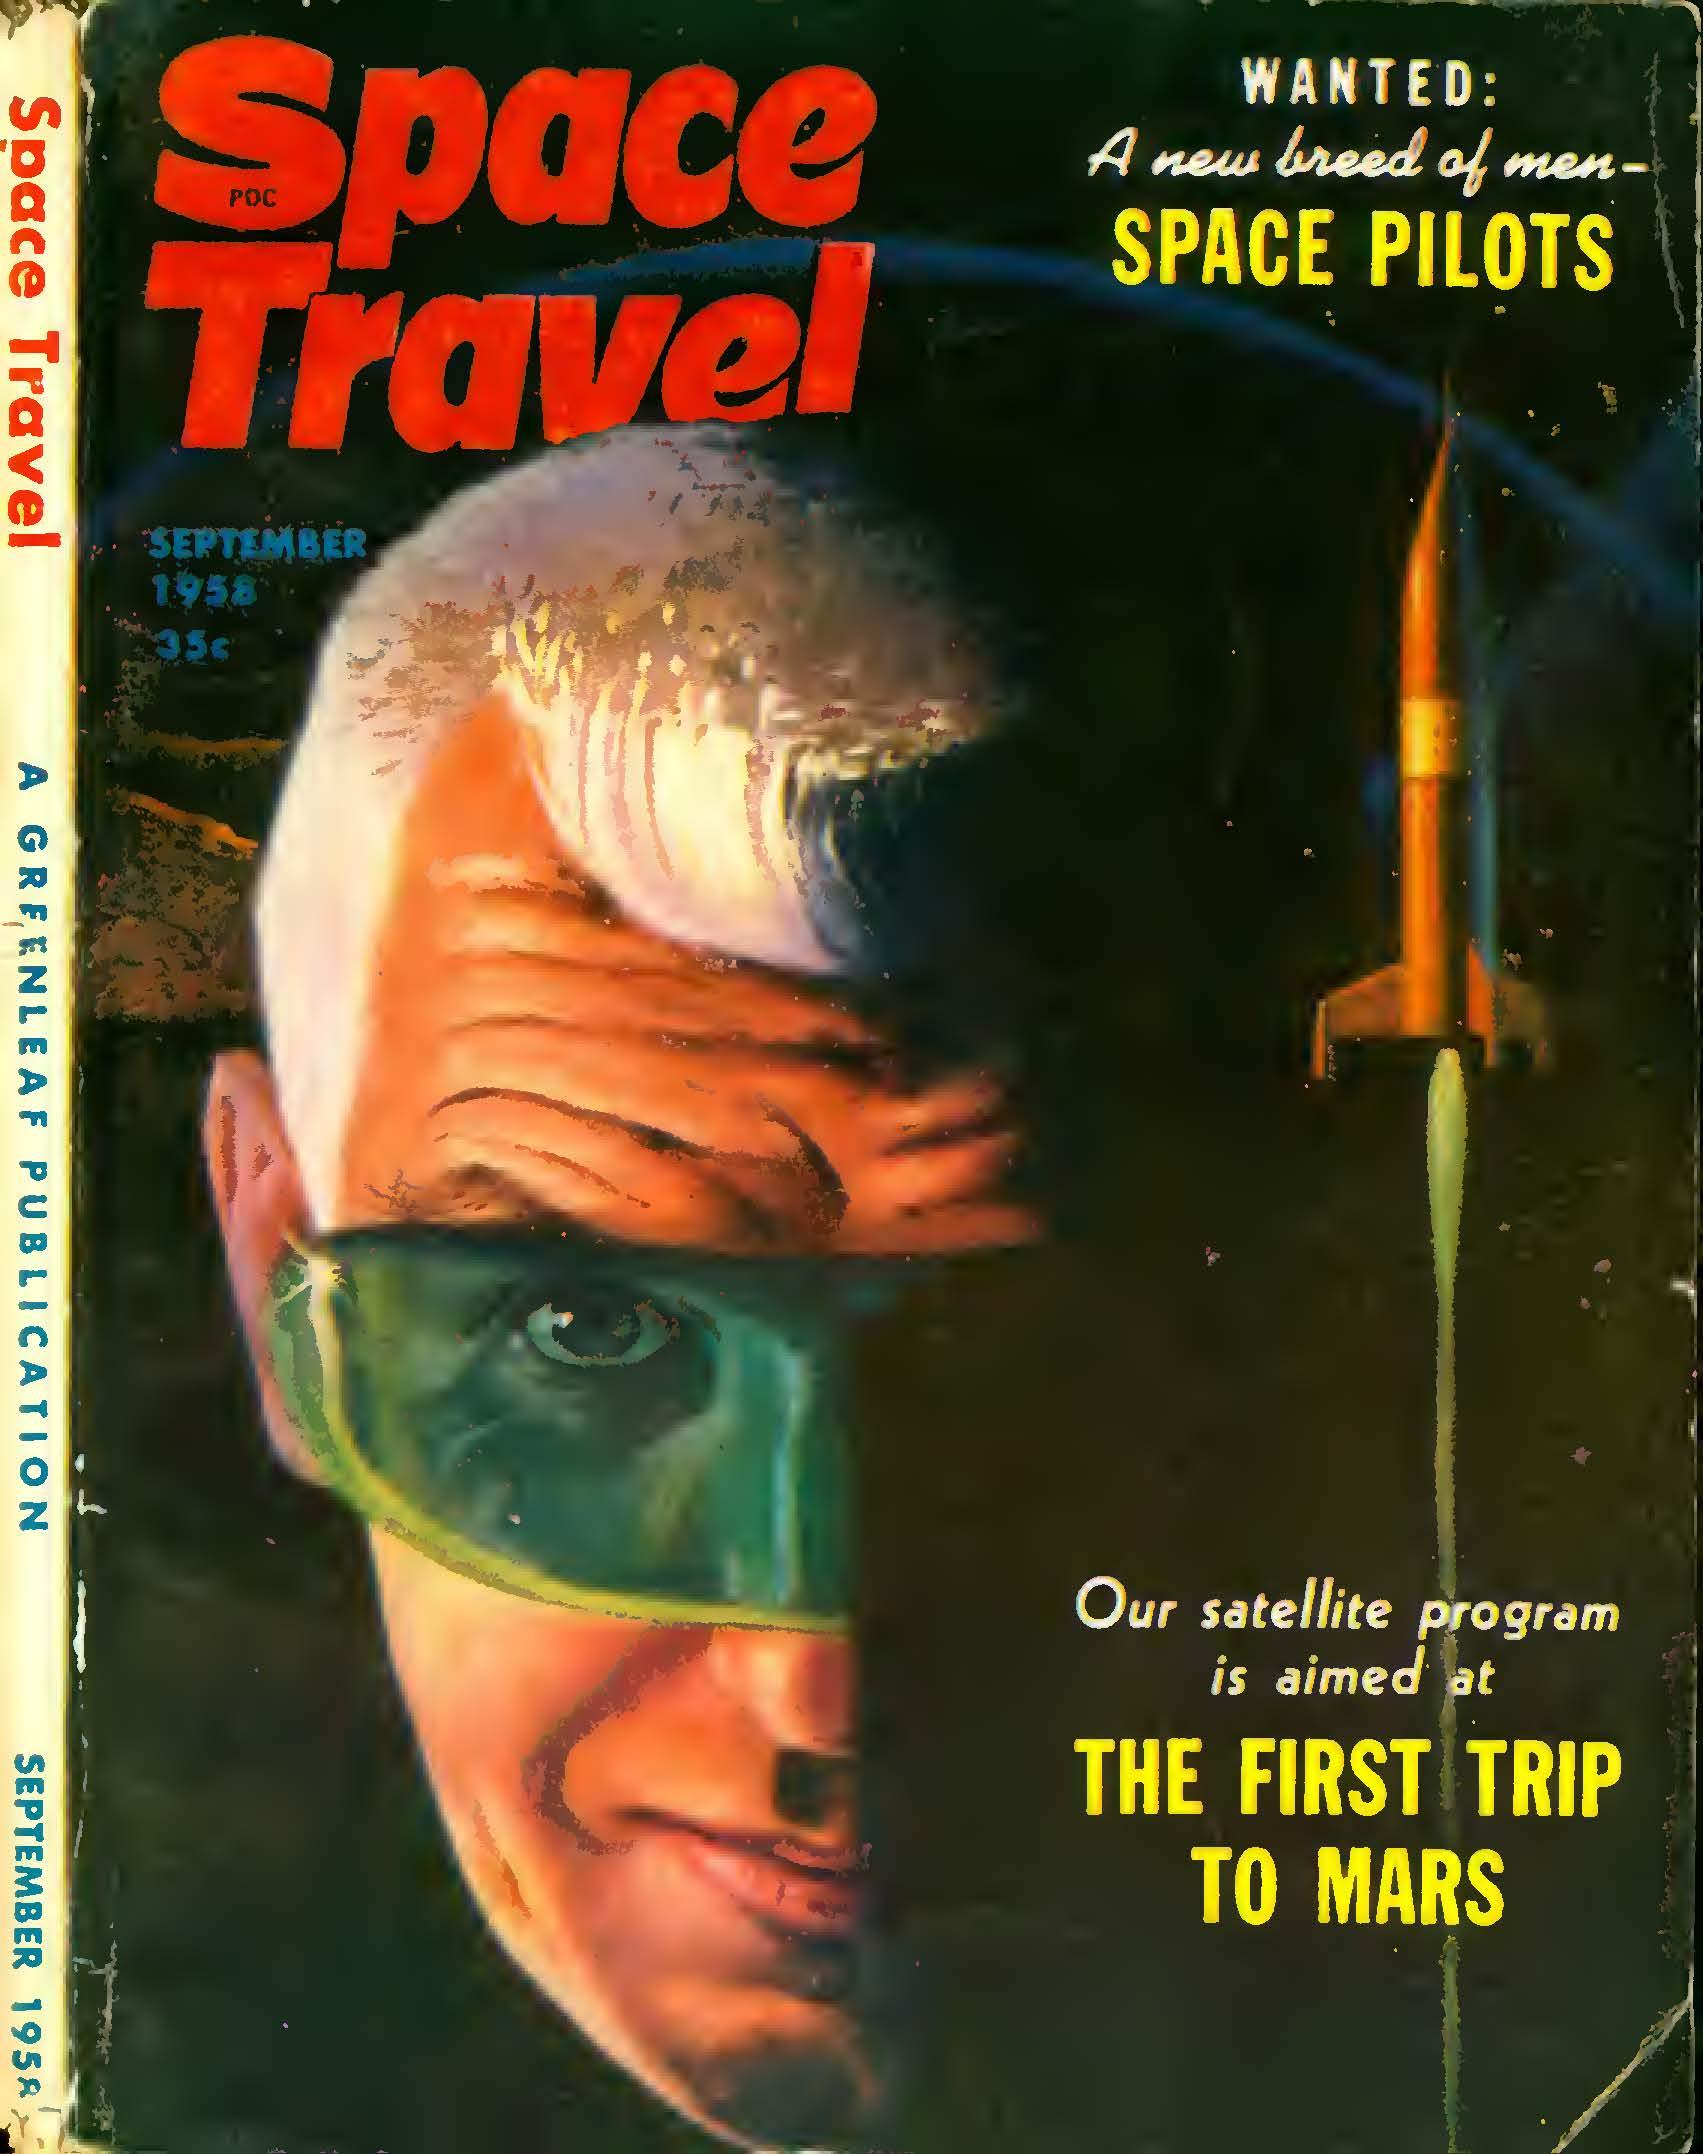 Space Travel, September 1958 (Volume 5, No. 5)